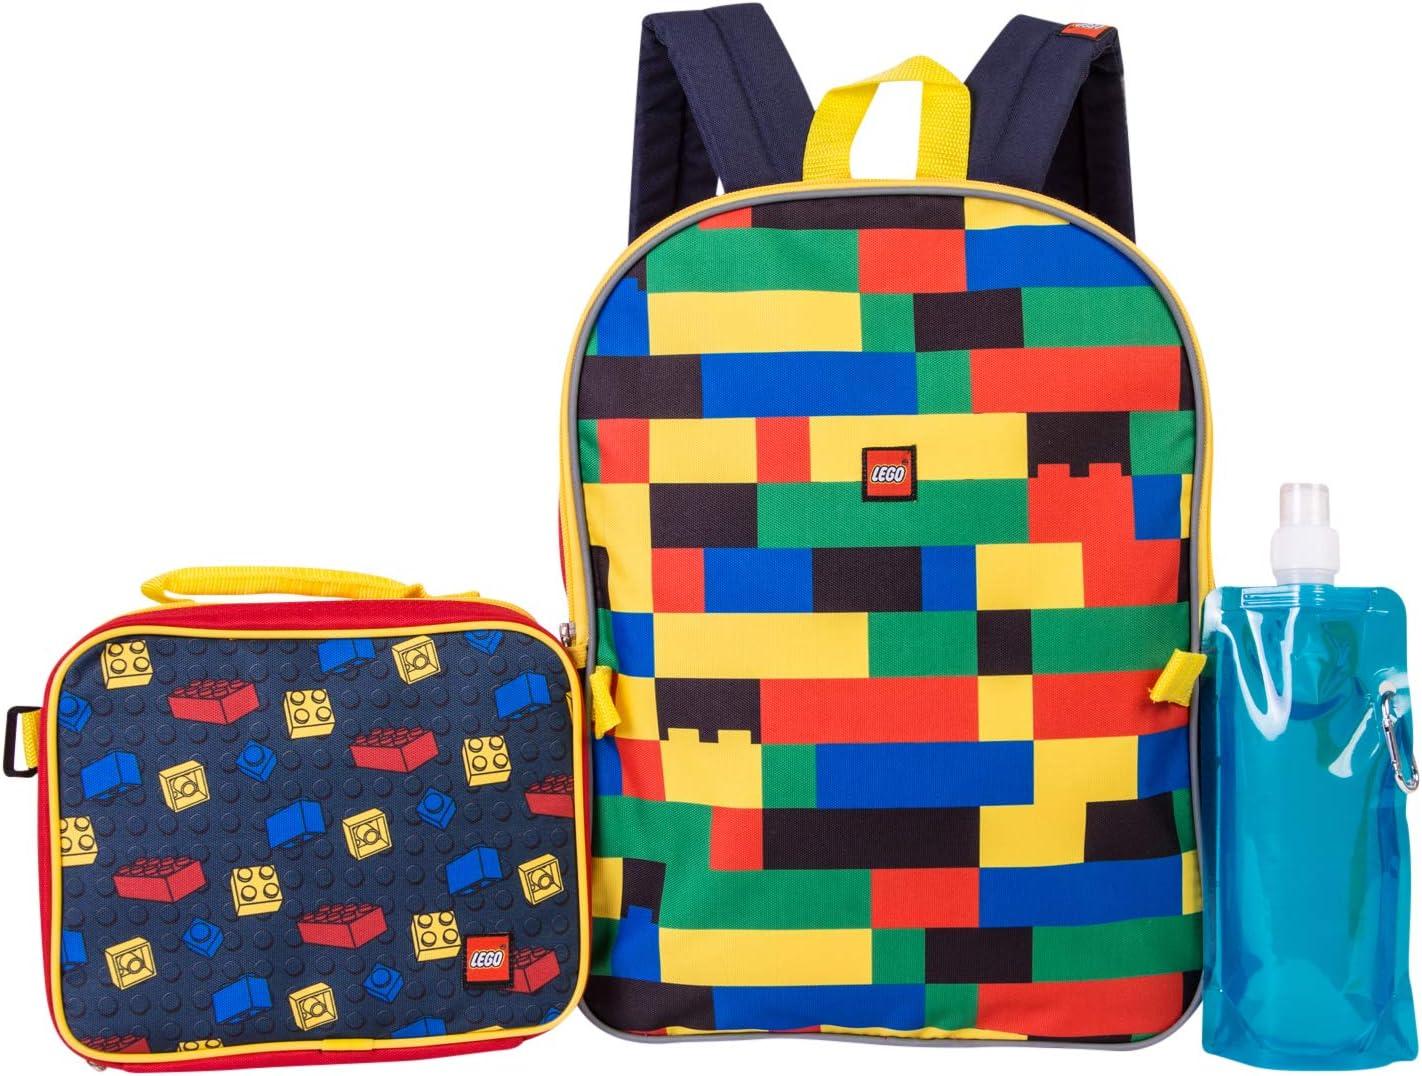 LEGO Batman Backpack Combo Set - Lego Boys' 4 Piece Backpack Set - Backpack & Lunch Kit